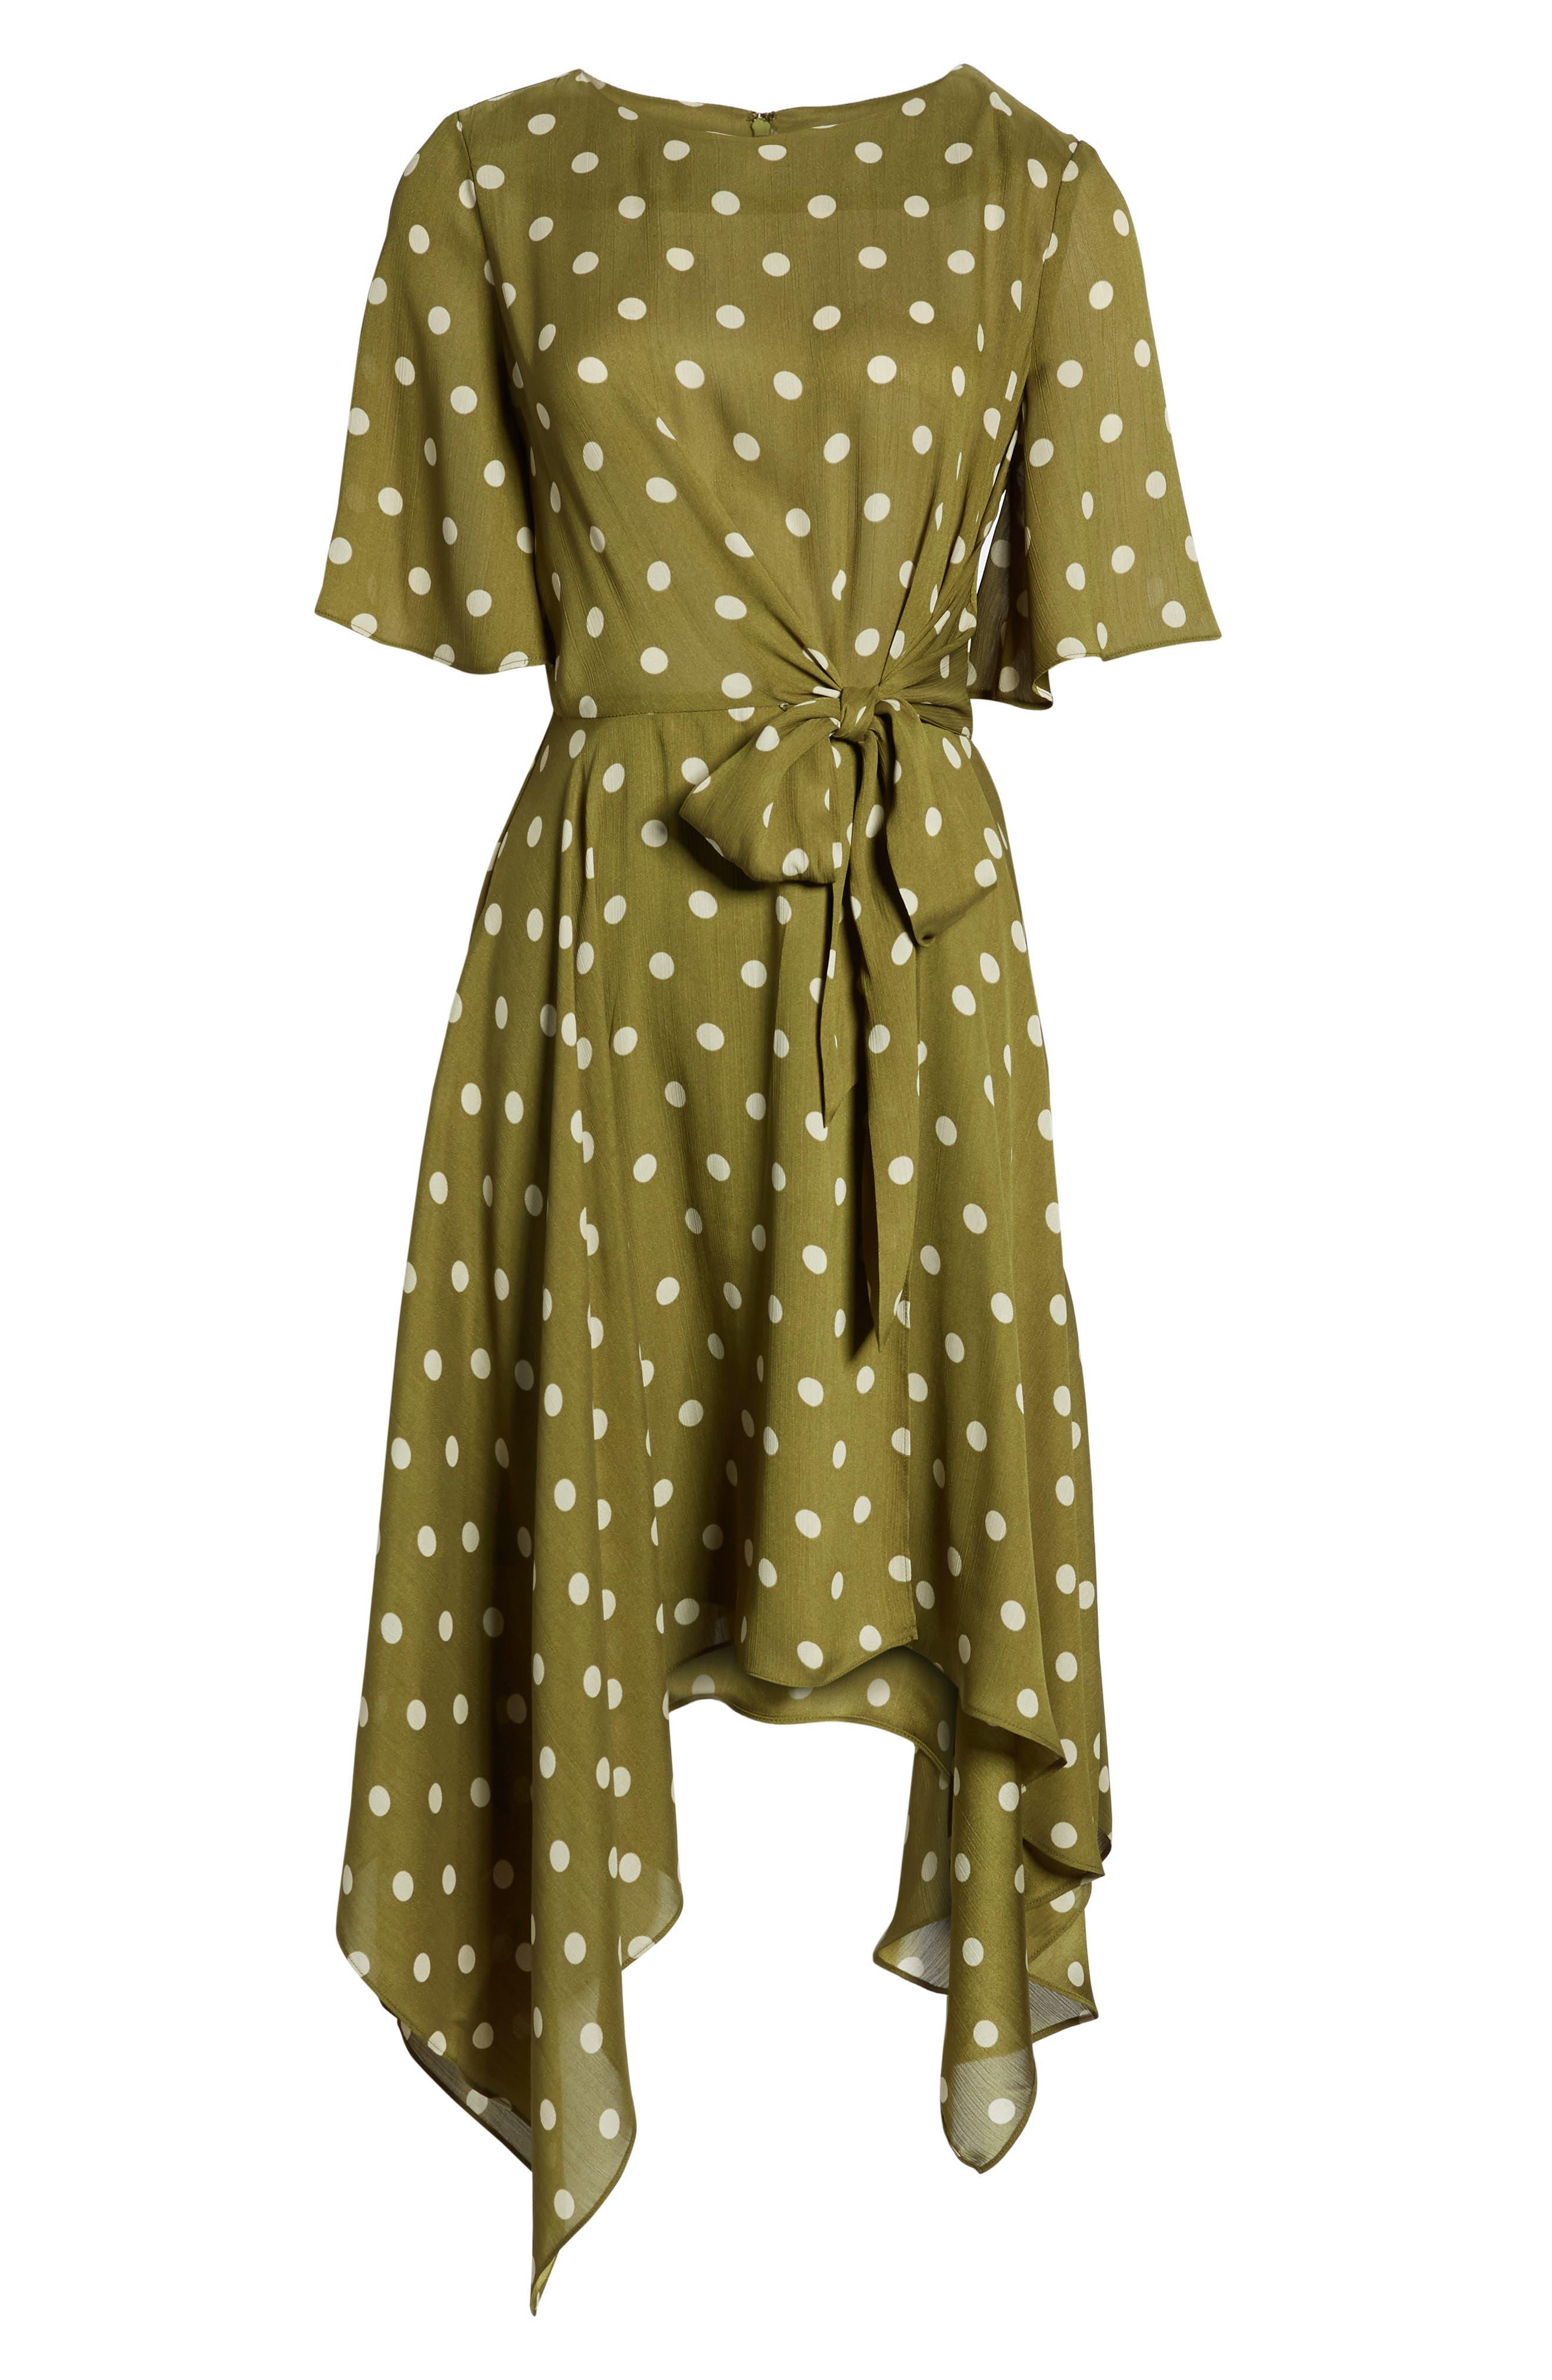 CHRISELLE LIM COLLECTION, Chriselle Lim Marie Handkerchief Hem Midi Dress, Alternate thumbnail 7, color, CREAM/ OLIVE